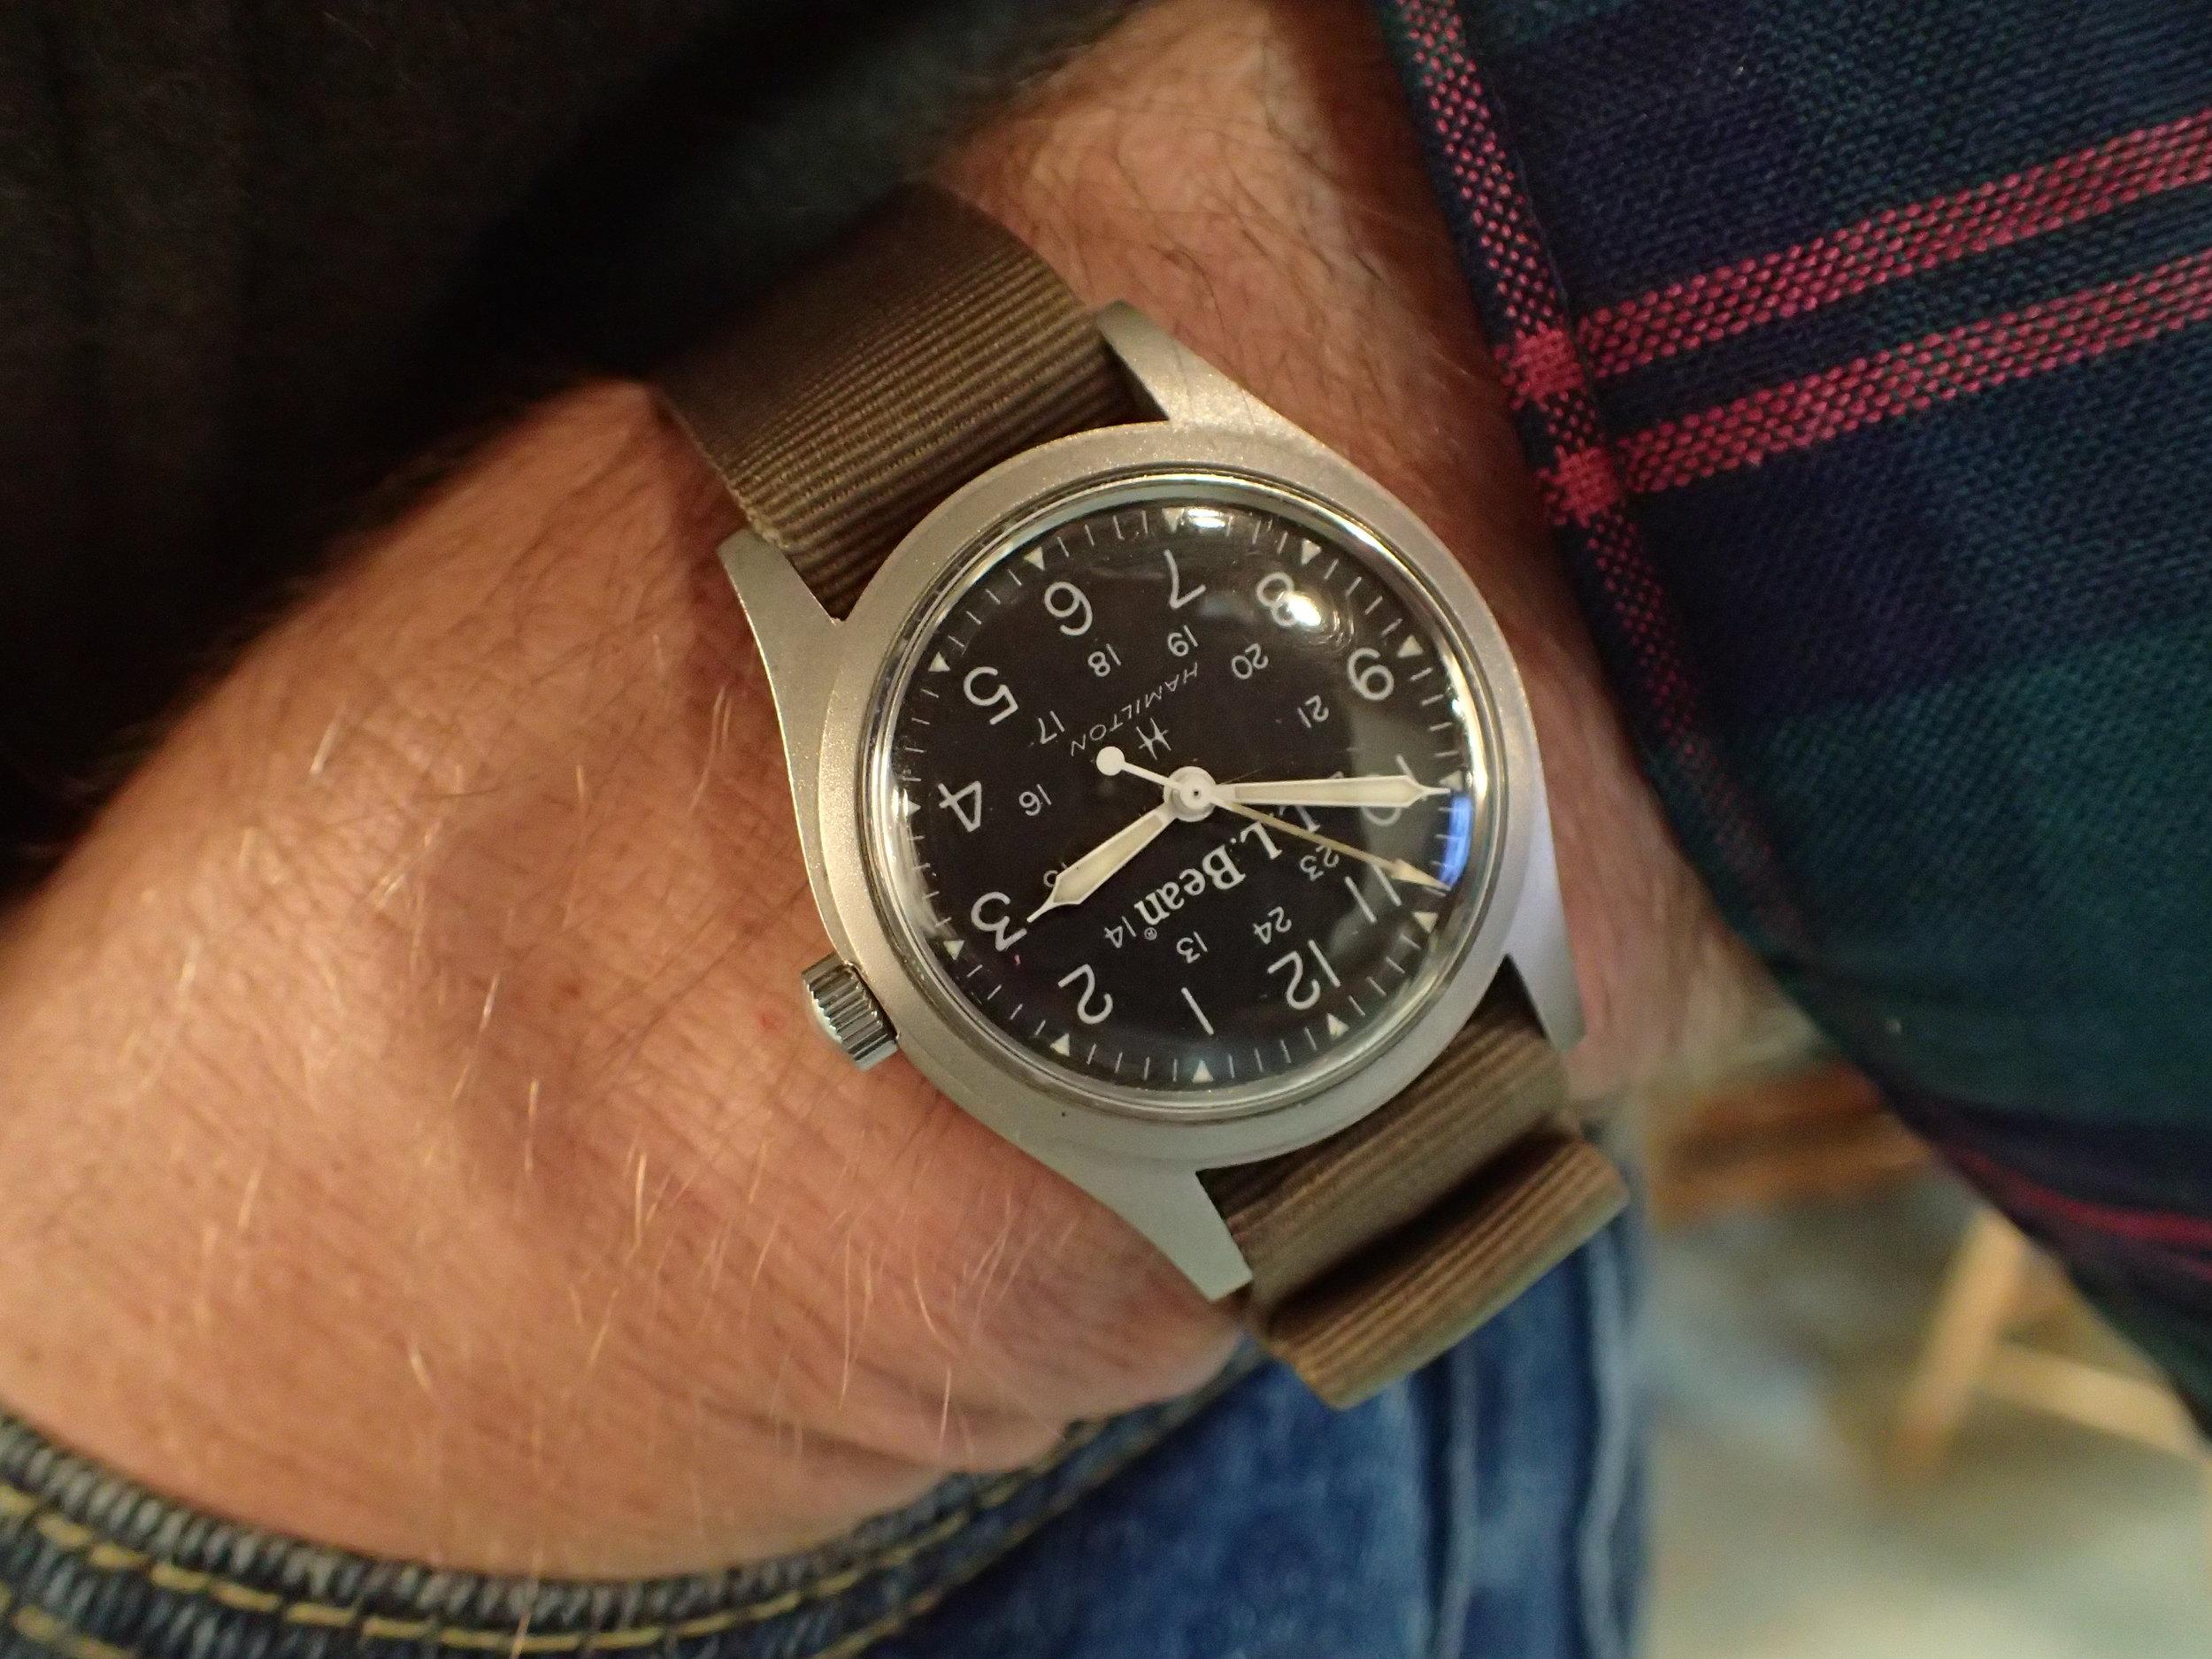 Hamilton 9219 on the wrist.